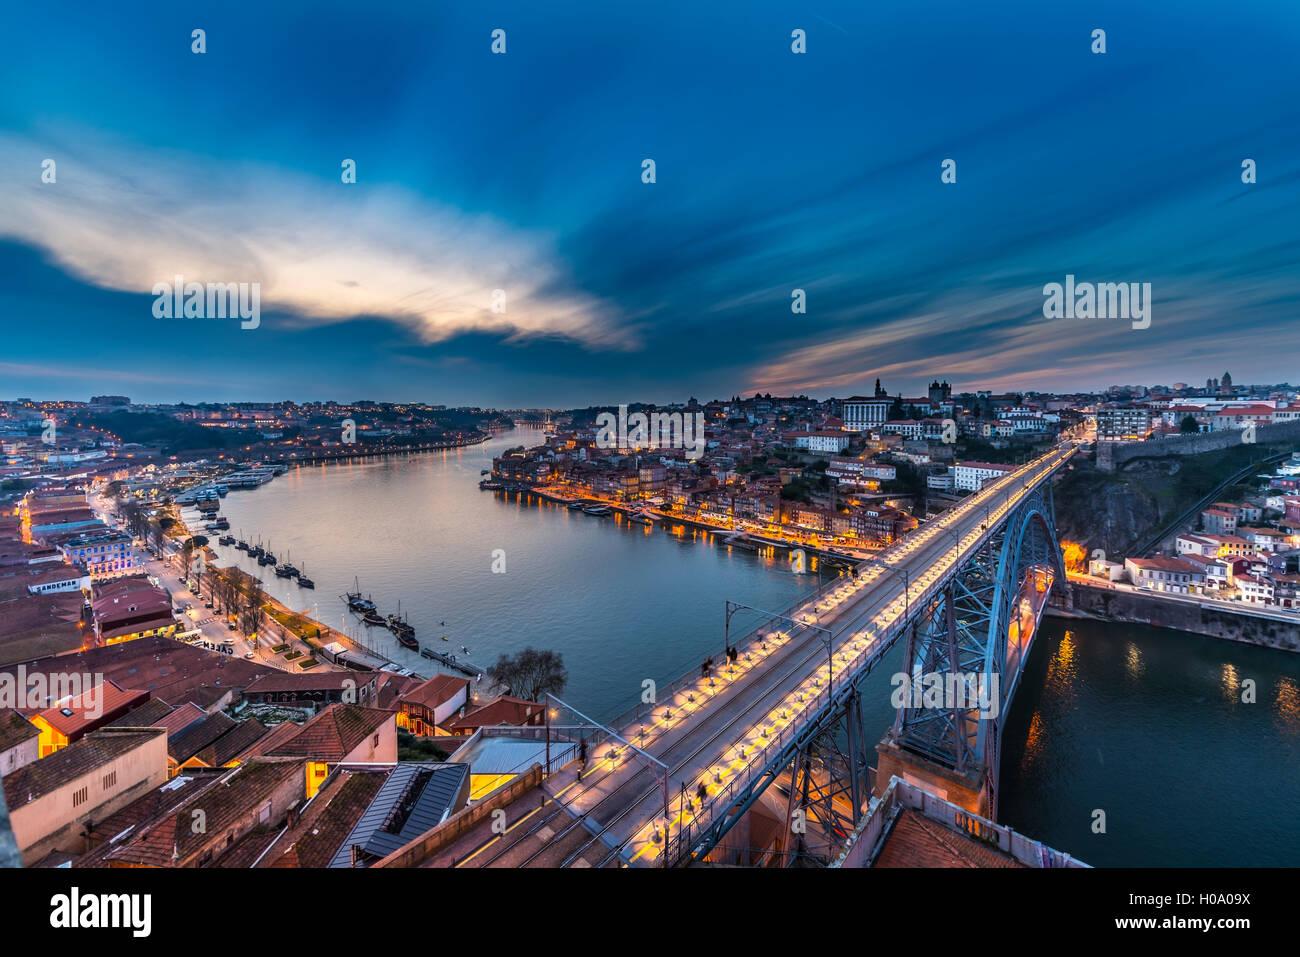 View over Porto with Ponte Dom Luís I Bridge across River Douro, dusk, Porto, Portugal - Stock Image